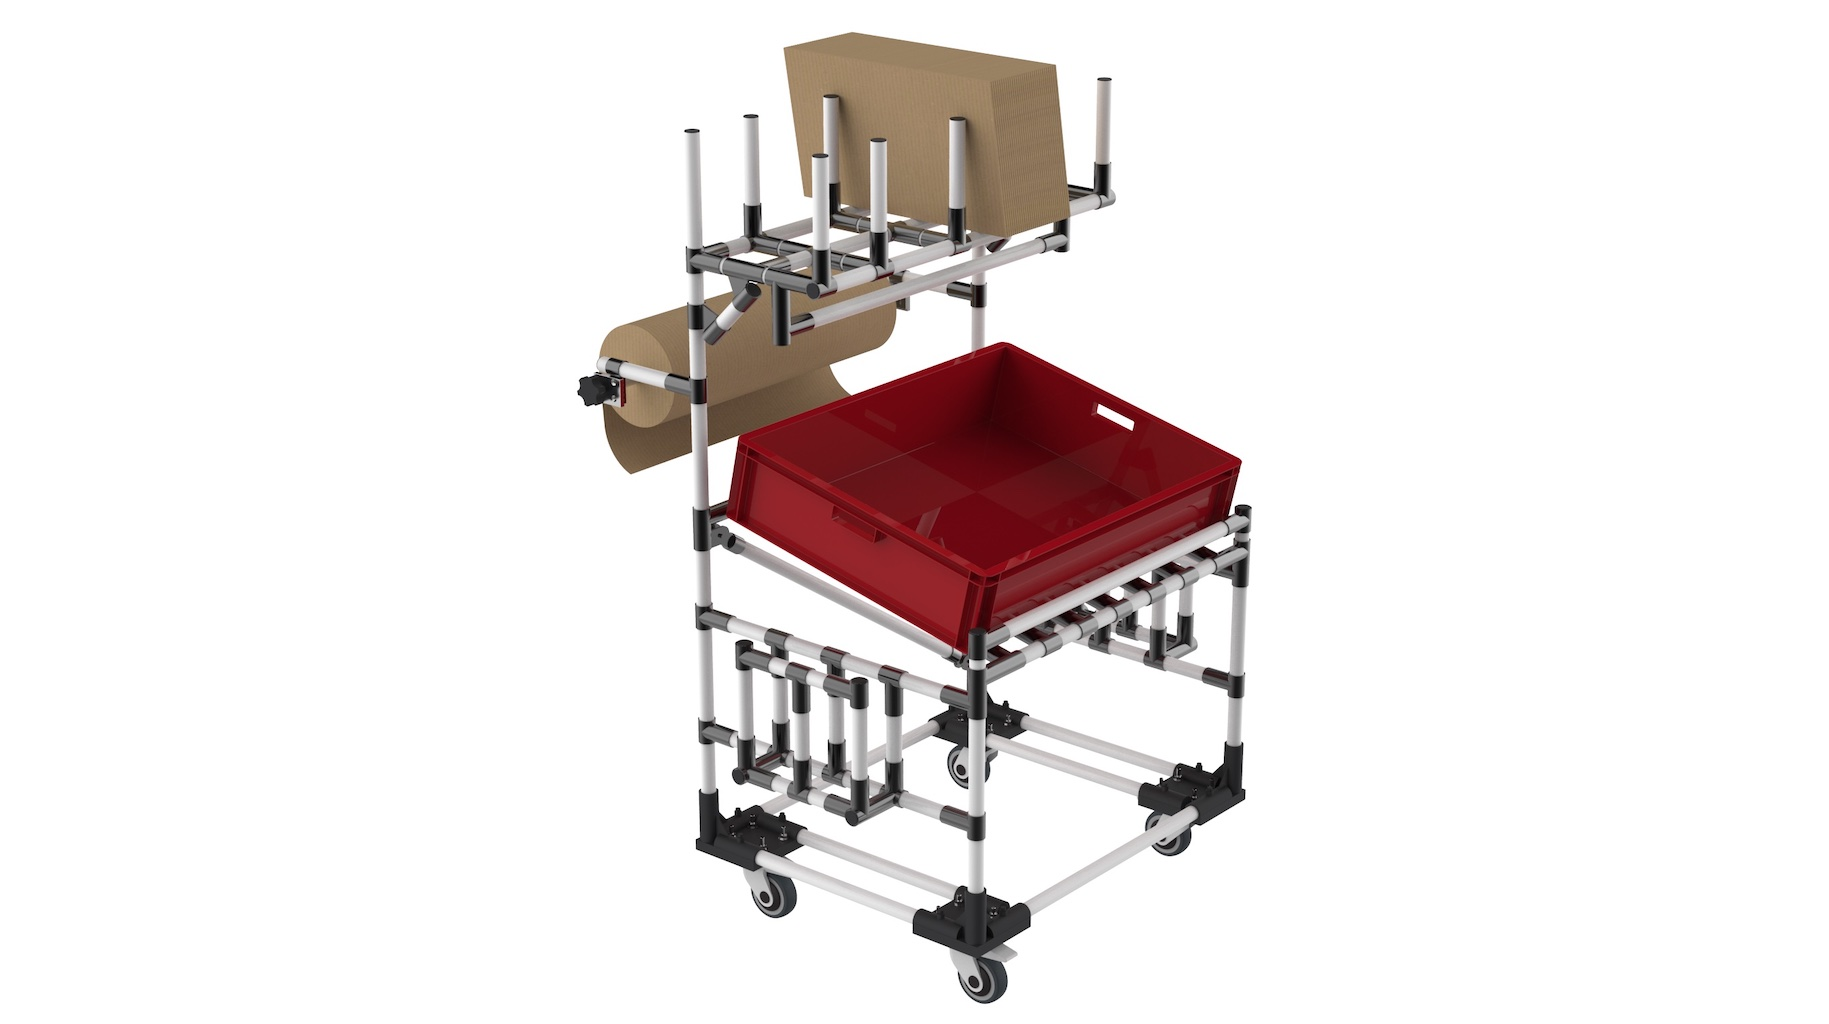 Logistics - Multifunctional cart